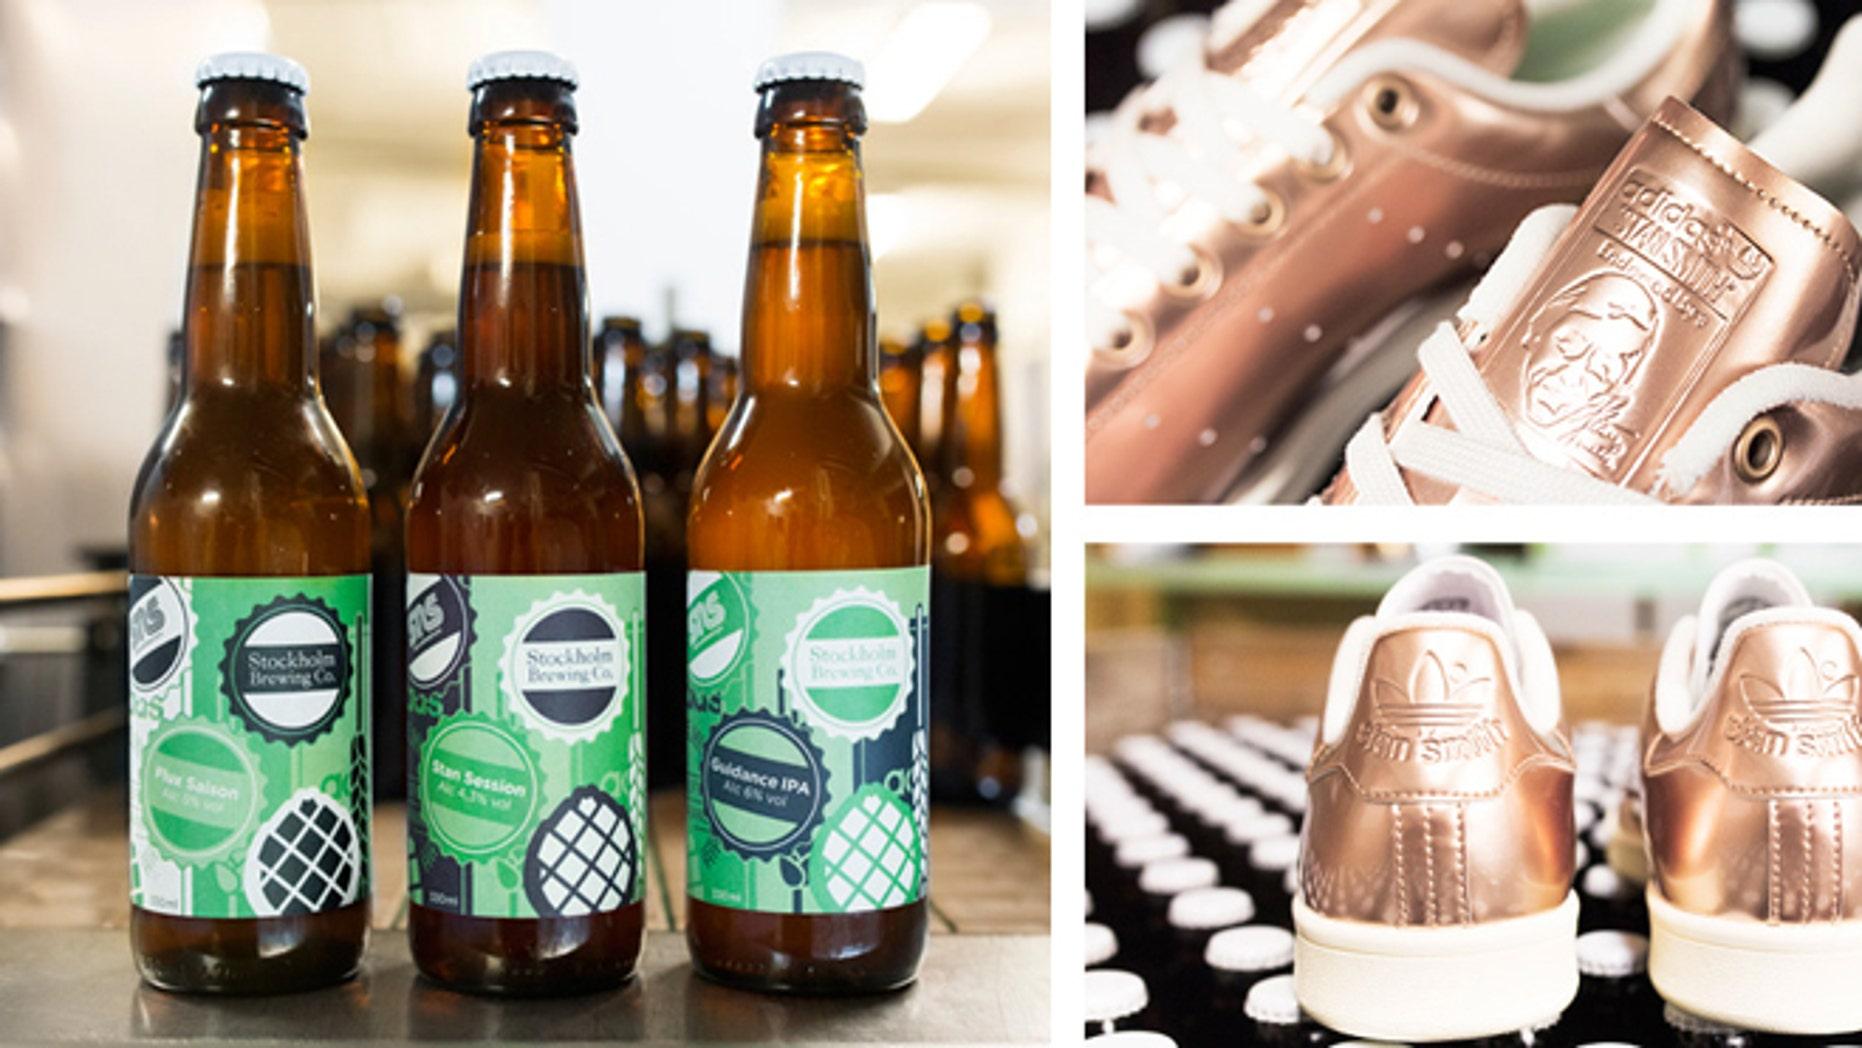 Beer inspired by sneakers inspired by beer.